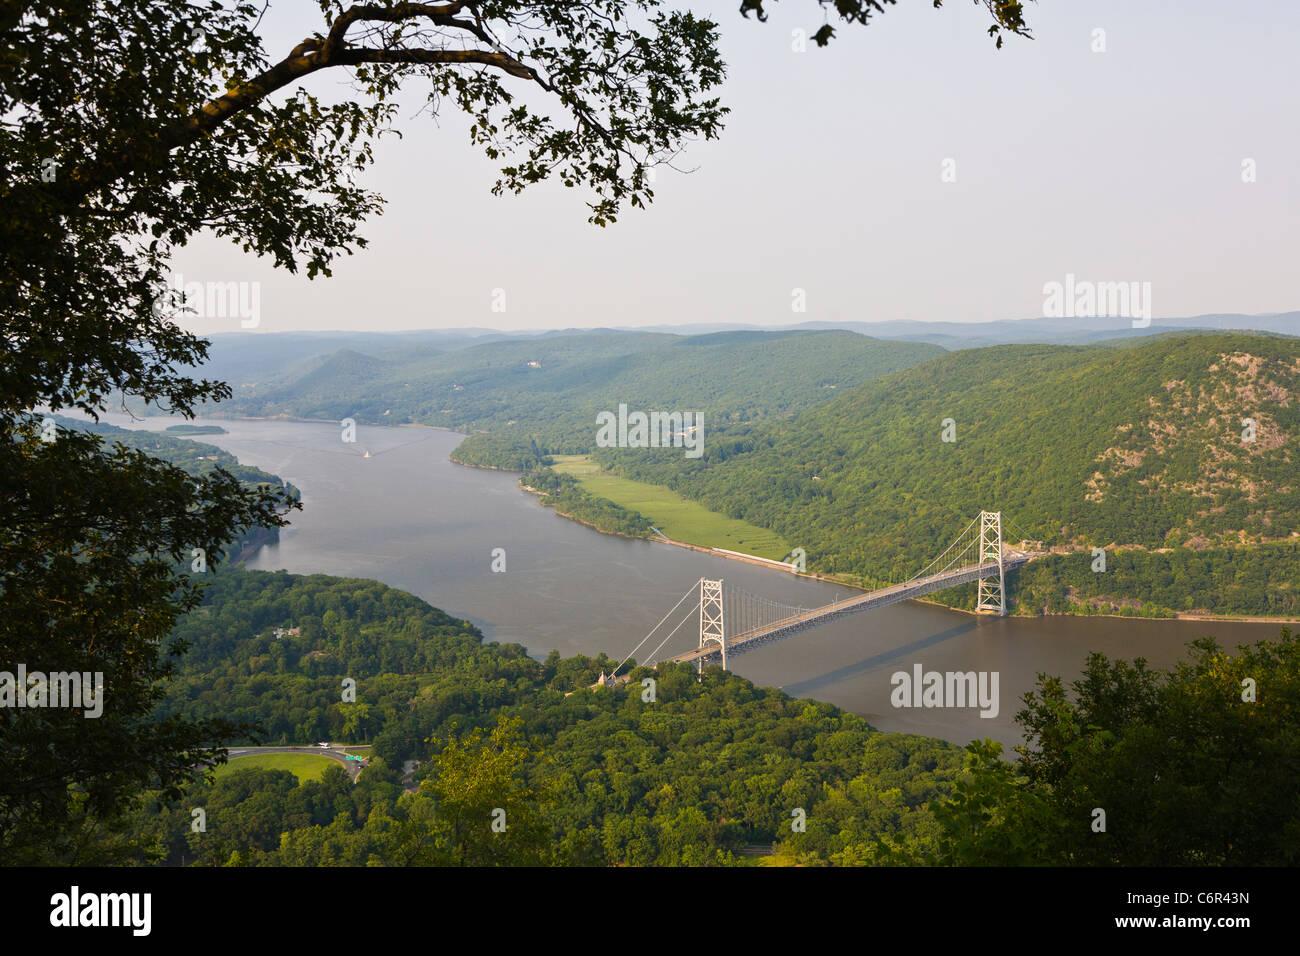 Bear Mountain Suspension Bridge across the Hudson River in New York State - Stock Image